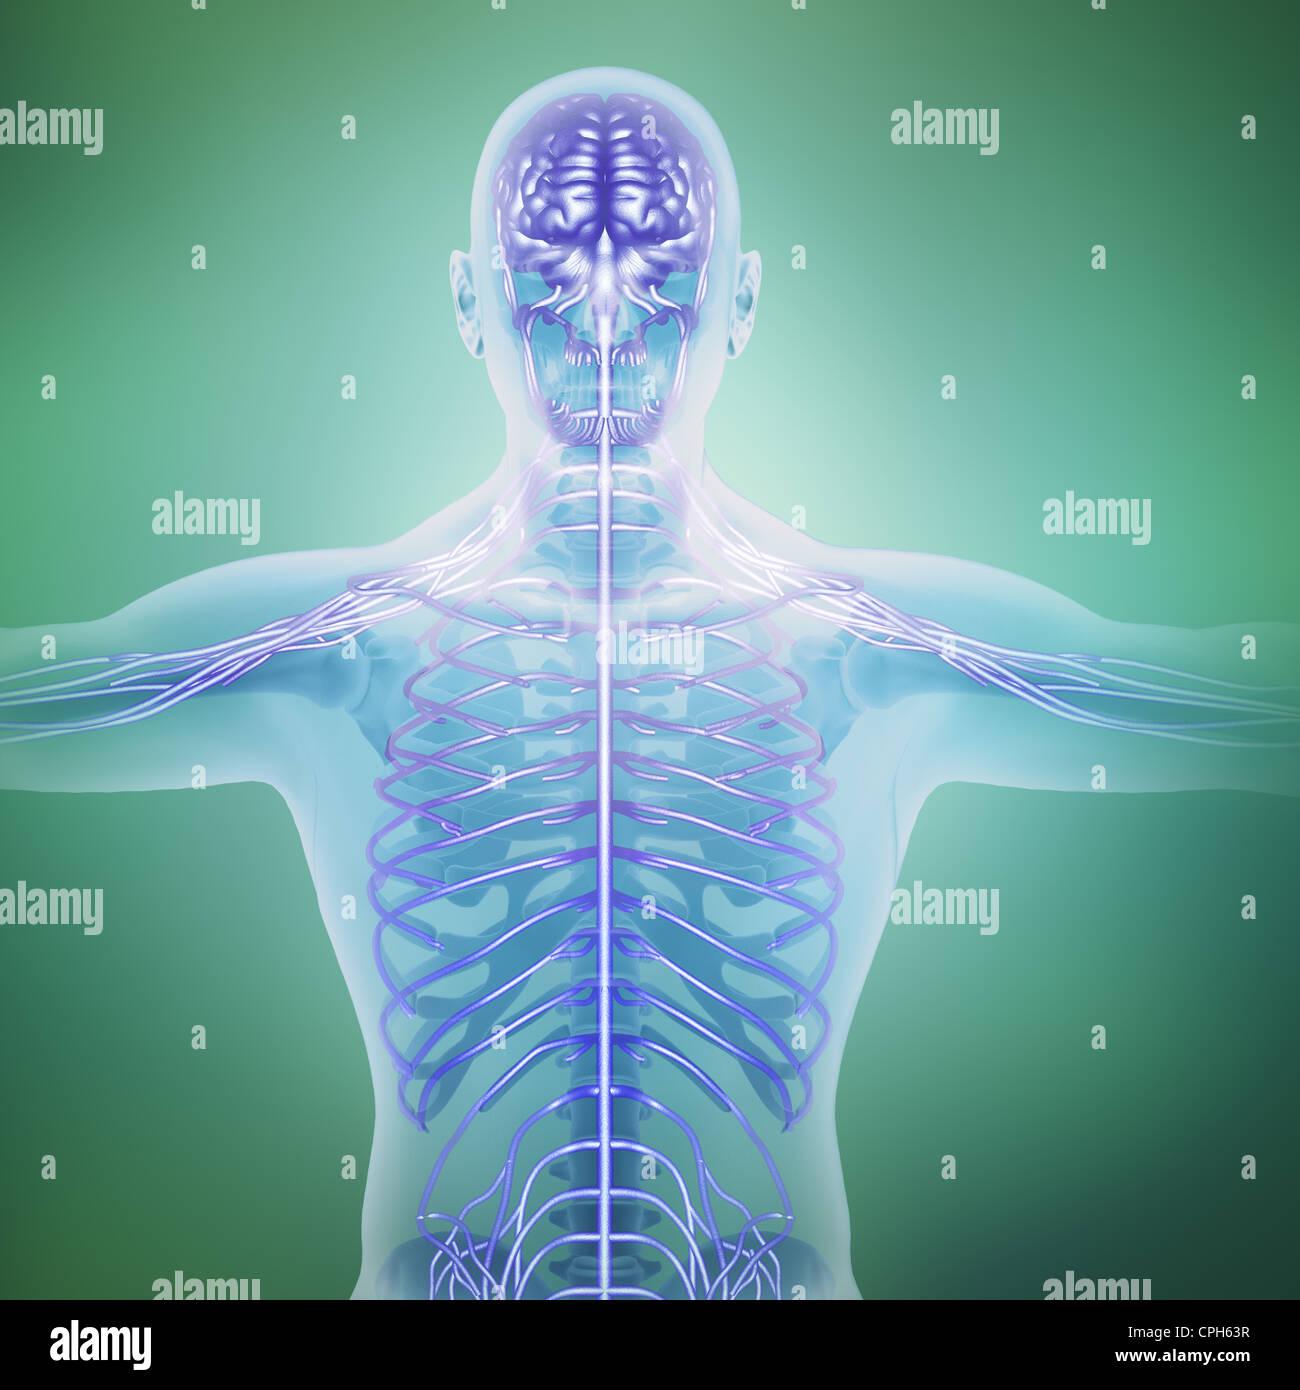 Human anatomy illustration - central nervous system Stock Photo